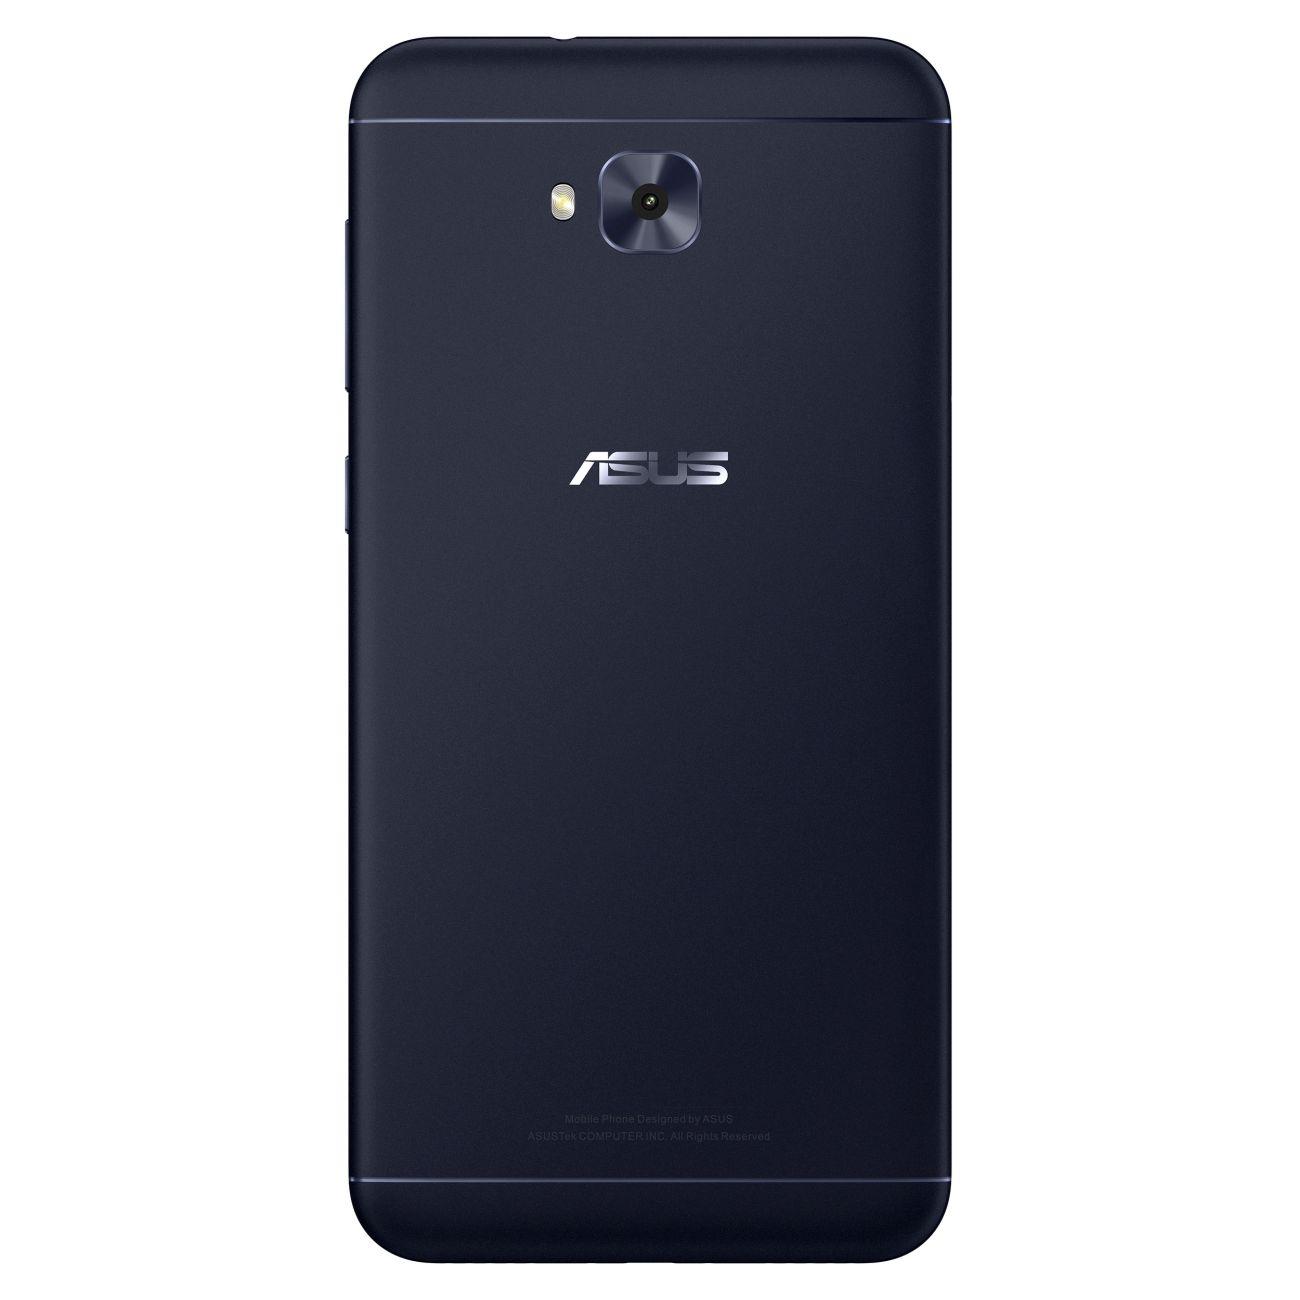 ZF4_selfie_AG02_NB copy